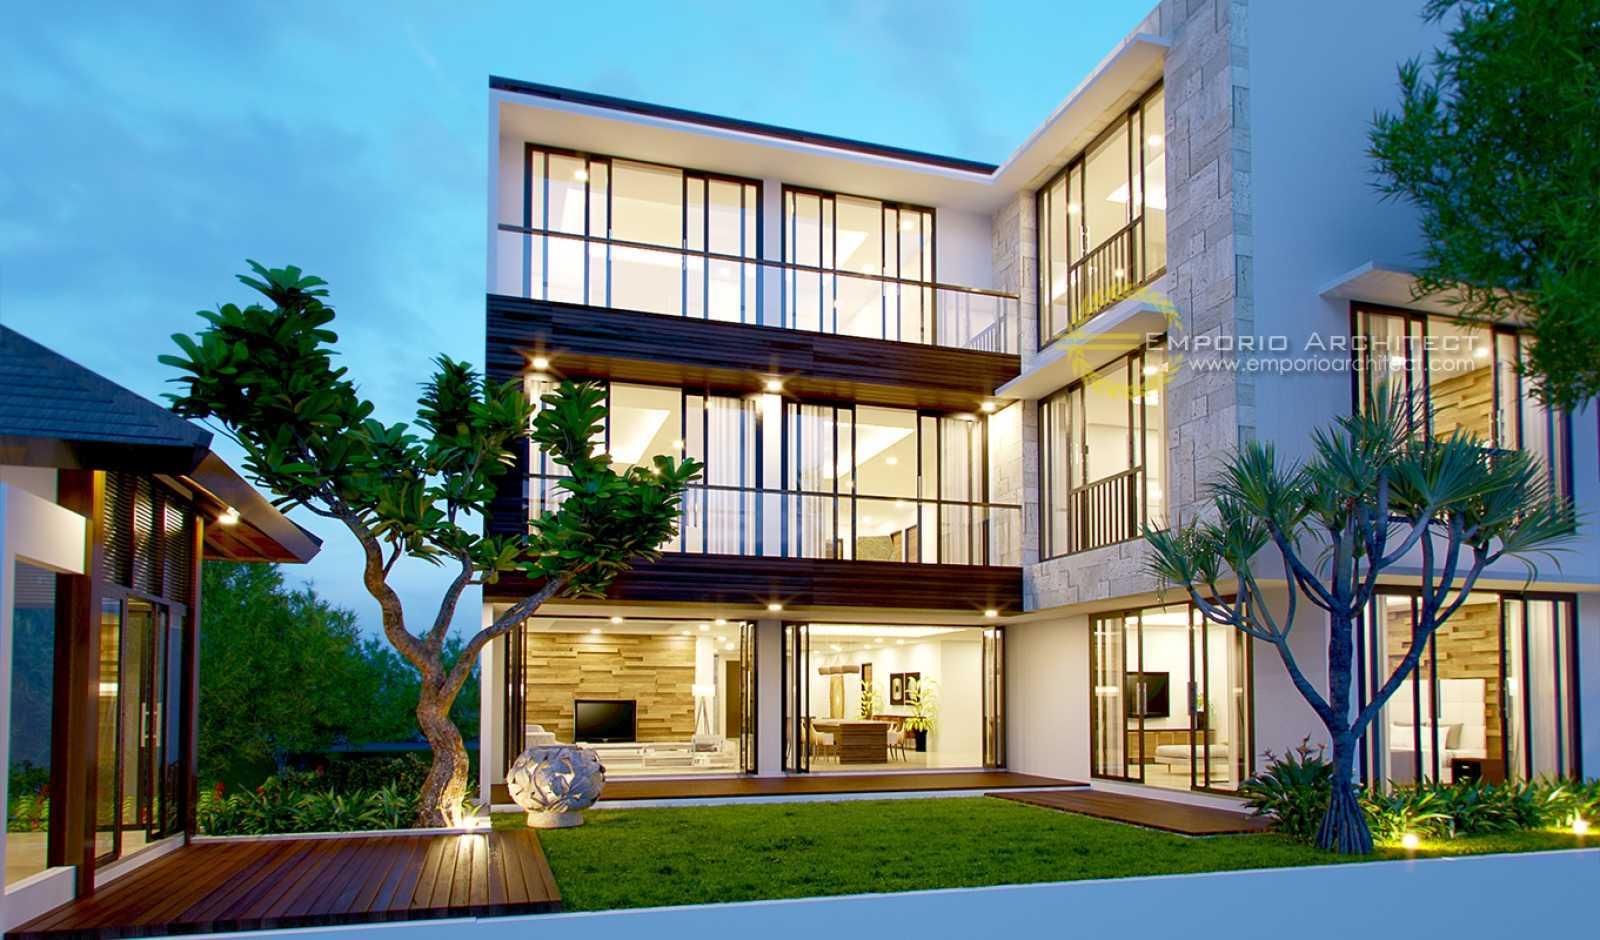 Emporio Architect Jasa Arsitek Bekasi Desain Rumah Modern Tropis 246 @ Cikarang, Bekasi Cikarang, Bekasi, Jawa Barat, Indonesia Cikarang, Bekasi, Jawa Barat, Indonesia Emporio-Architect-Jasa-Arsitek-Bekasi-Desain-Rumah-Modern-Tropis-246-Cikarang-Bekasi  79244